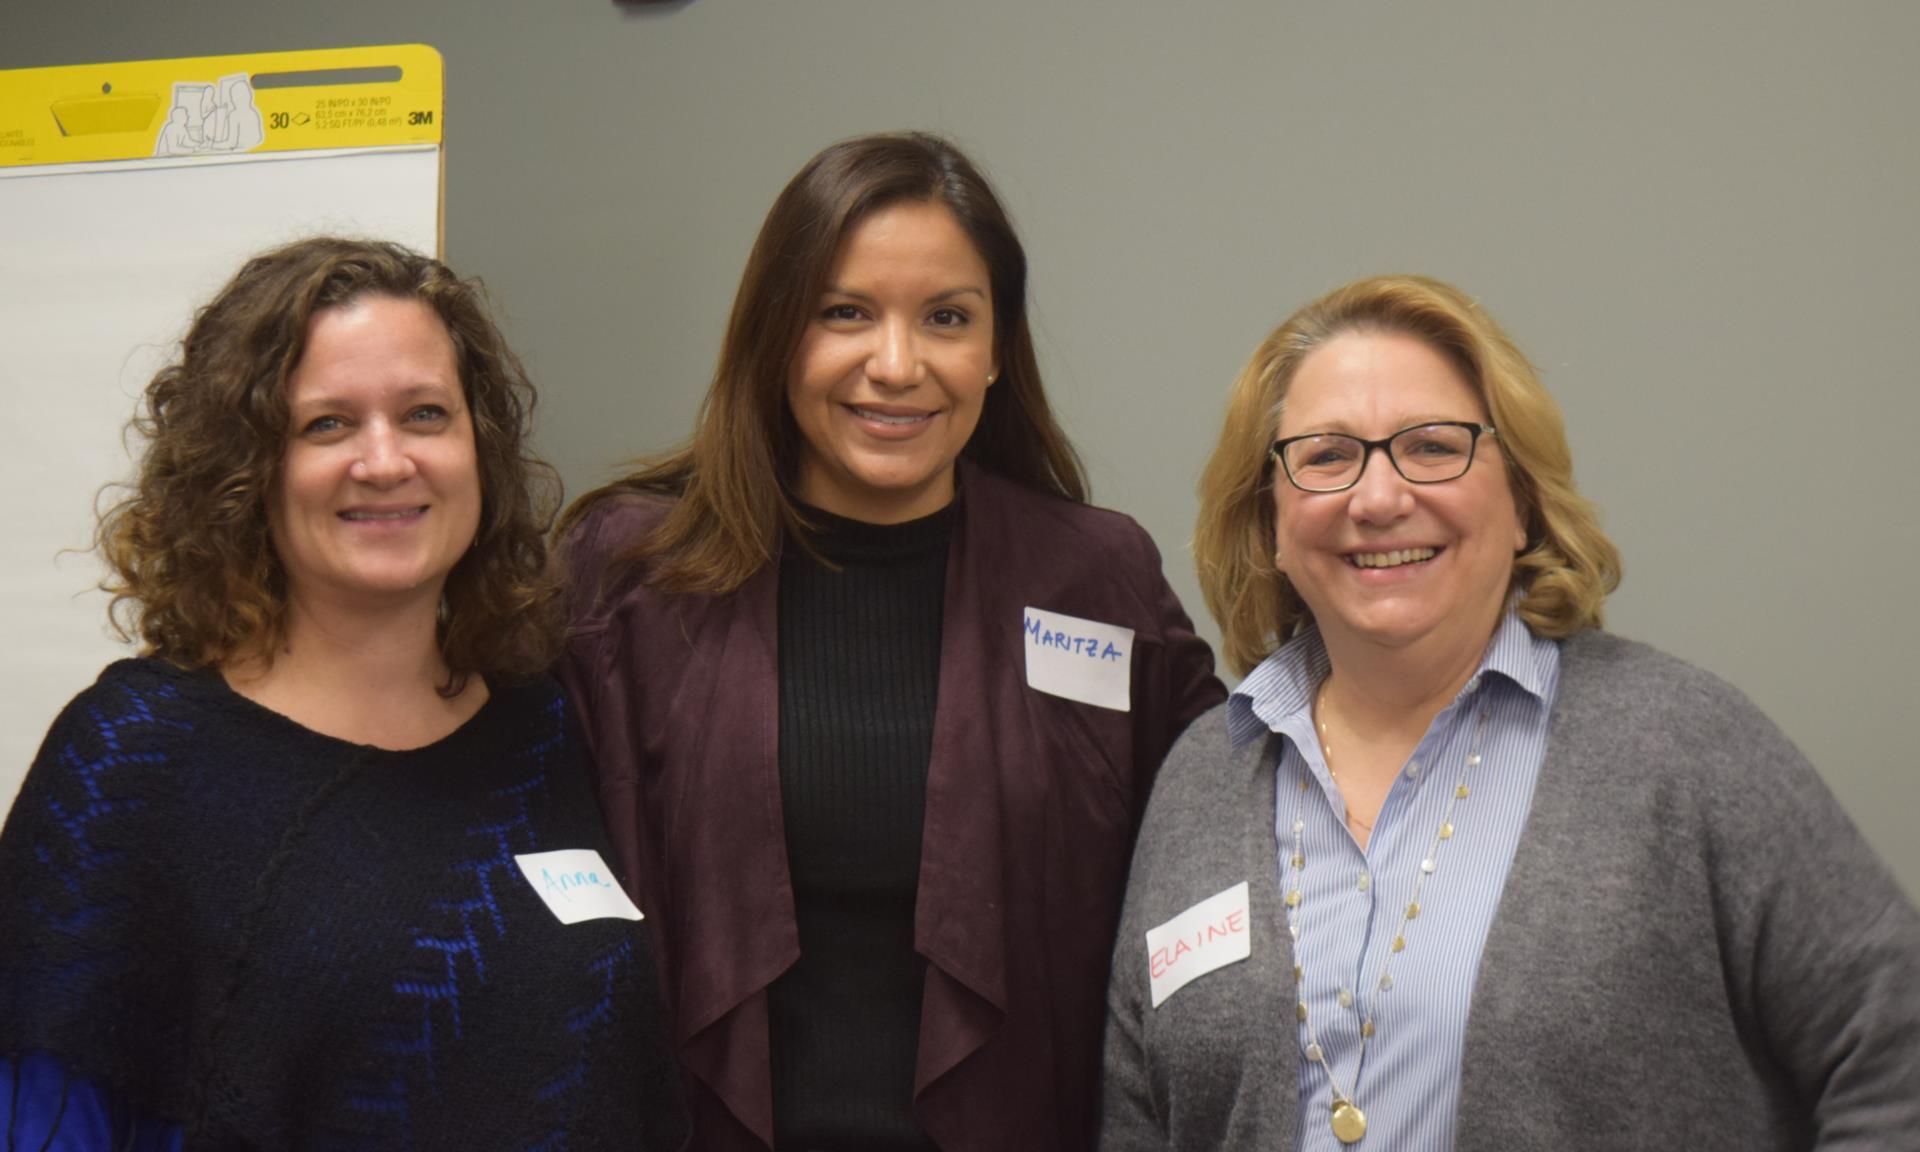 Anna Thornton Matos, Dr. Maritza Salazar Campo, and Dr. Elaine Borawski